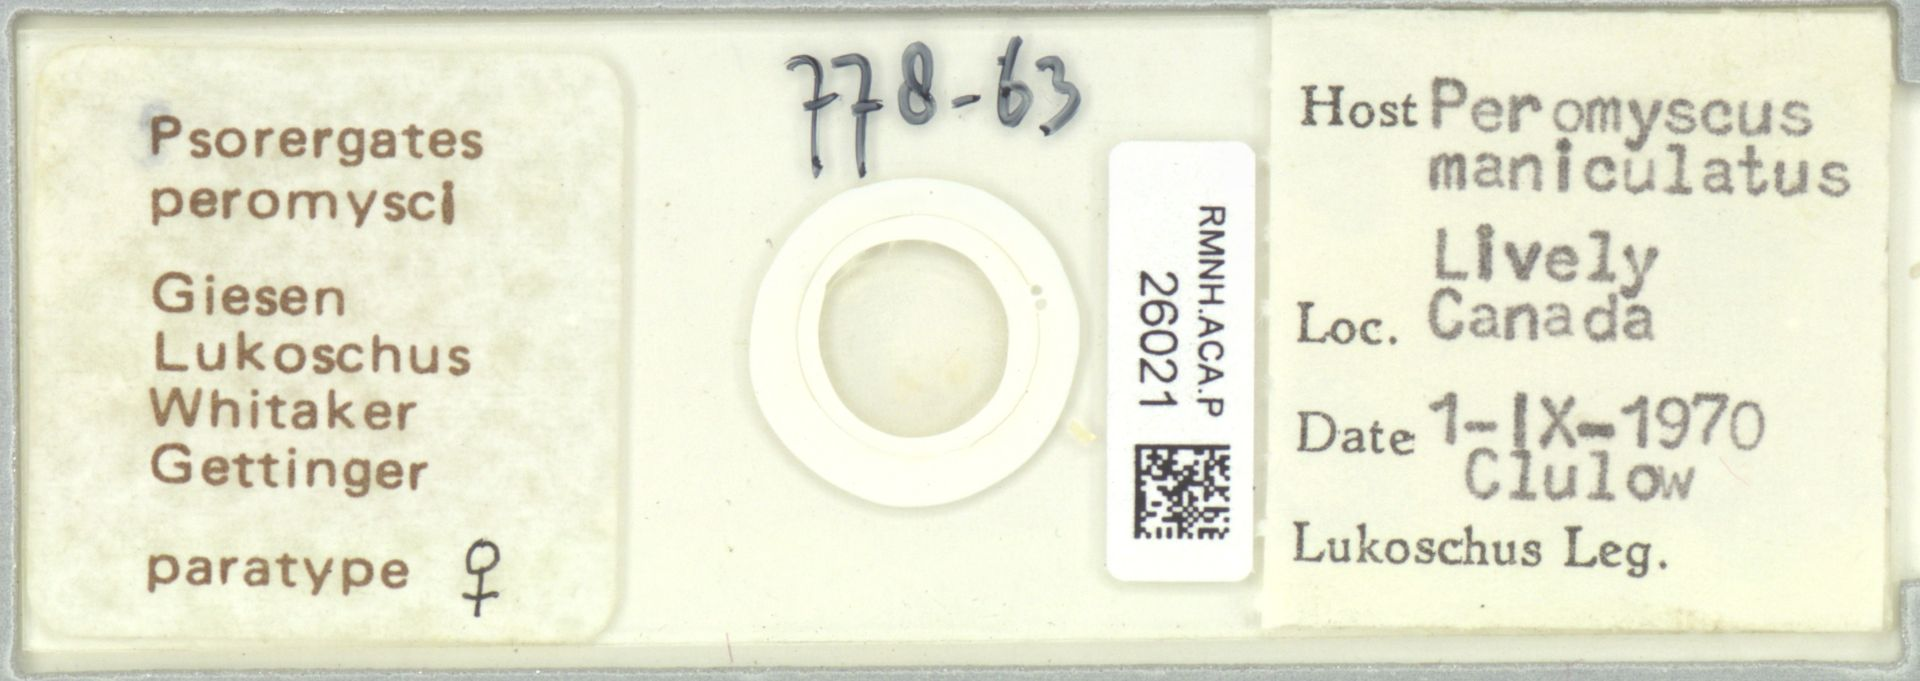 RMNH.ACA.P.26021 | Psorergates peromysci Giesen Lukoschus Whitaker Gettinger